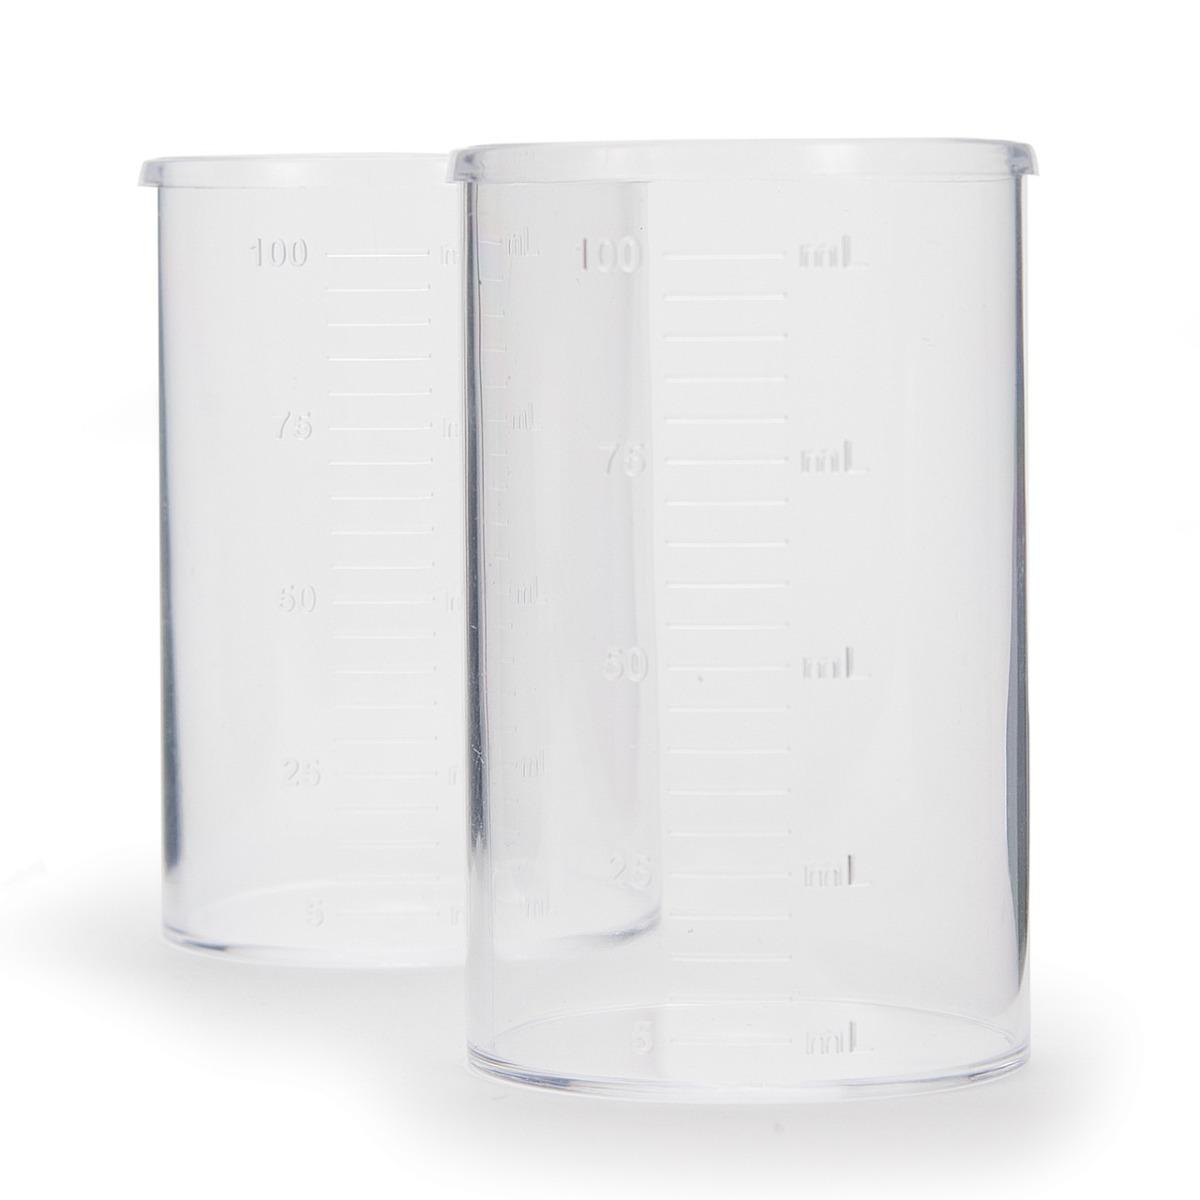 HI740036P Plastic Beaker Set, 100 mL